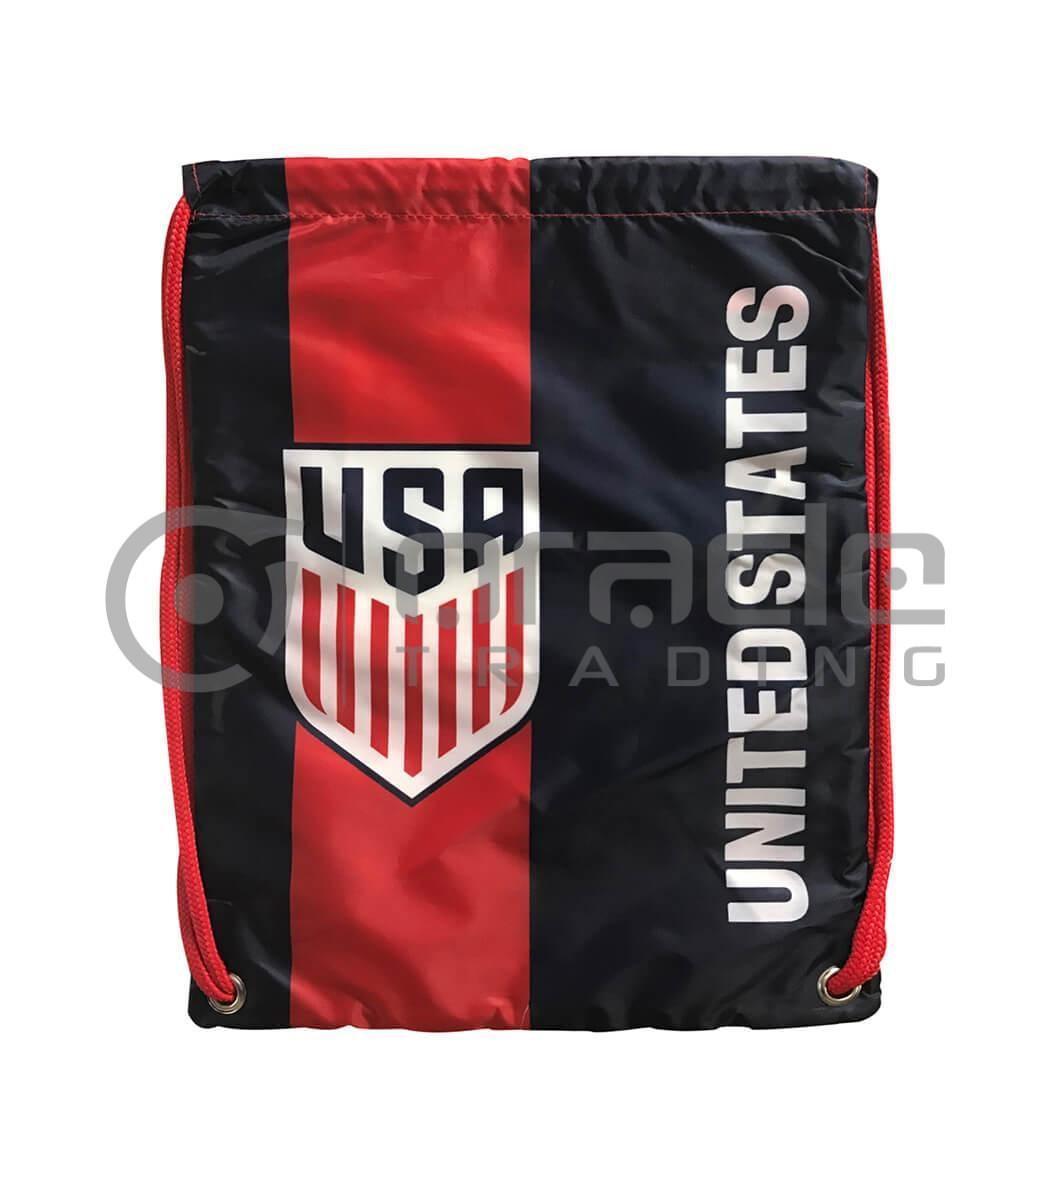 U.S. Soccer Gym Bag